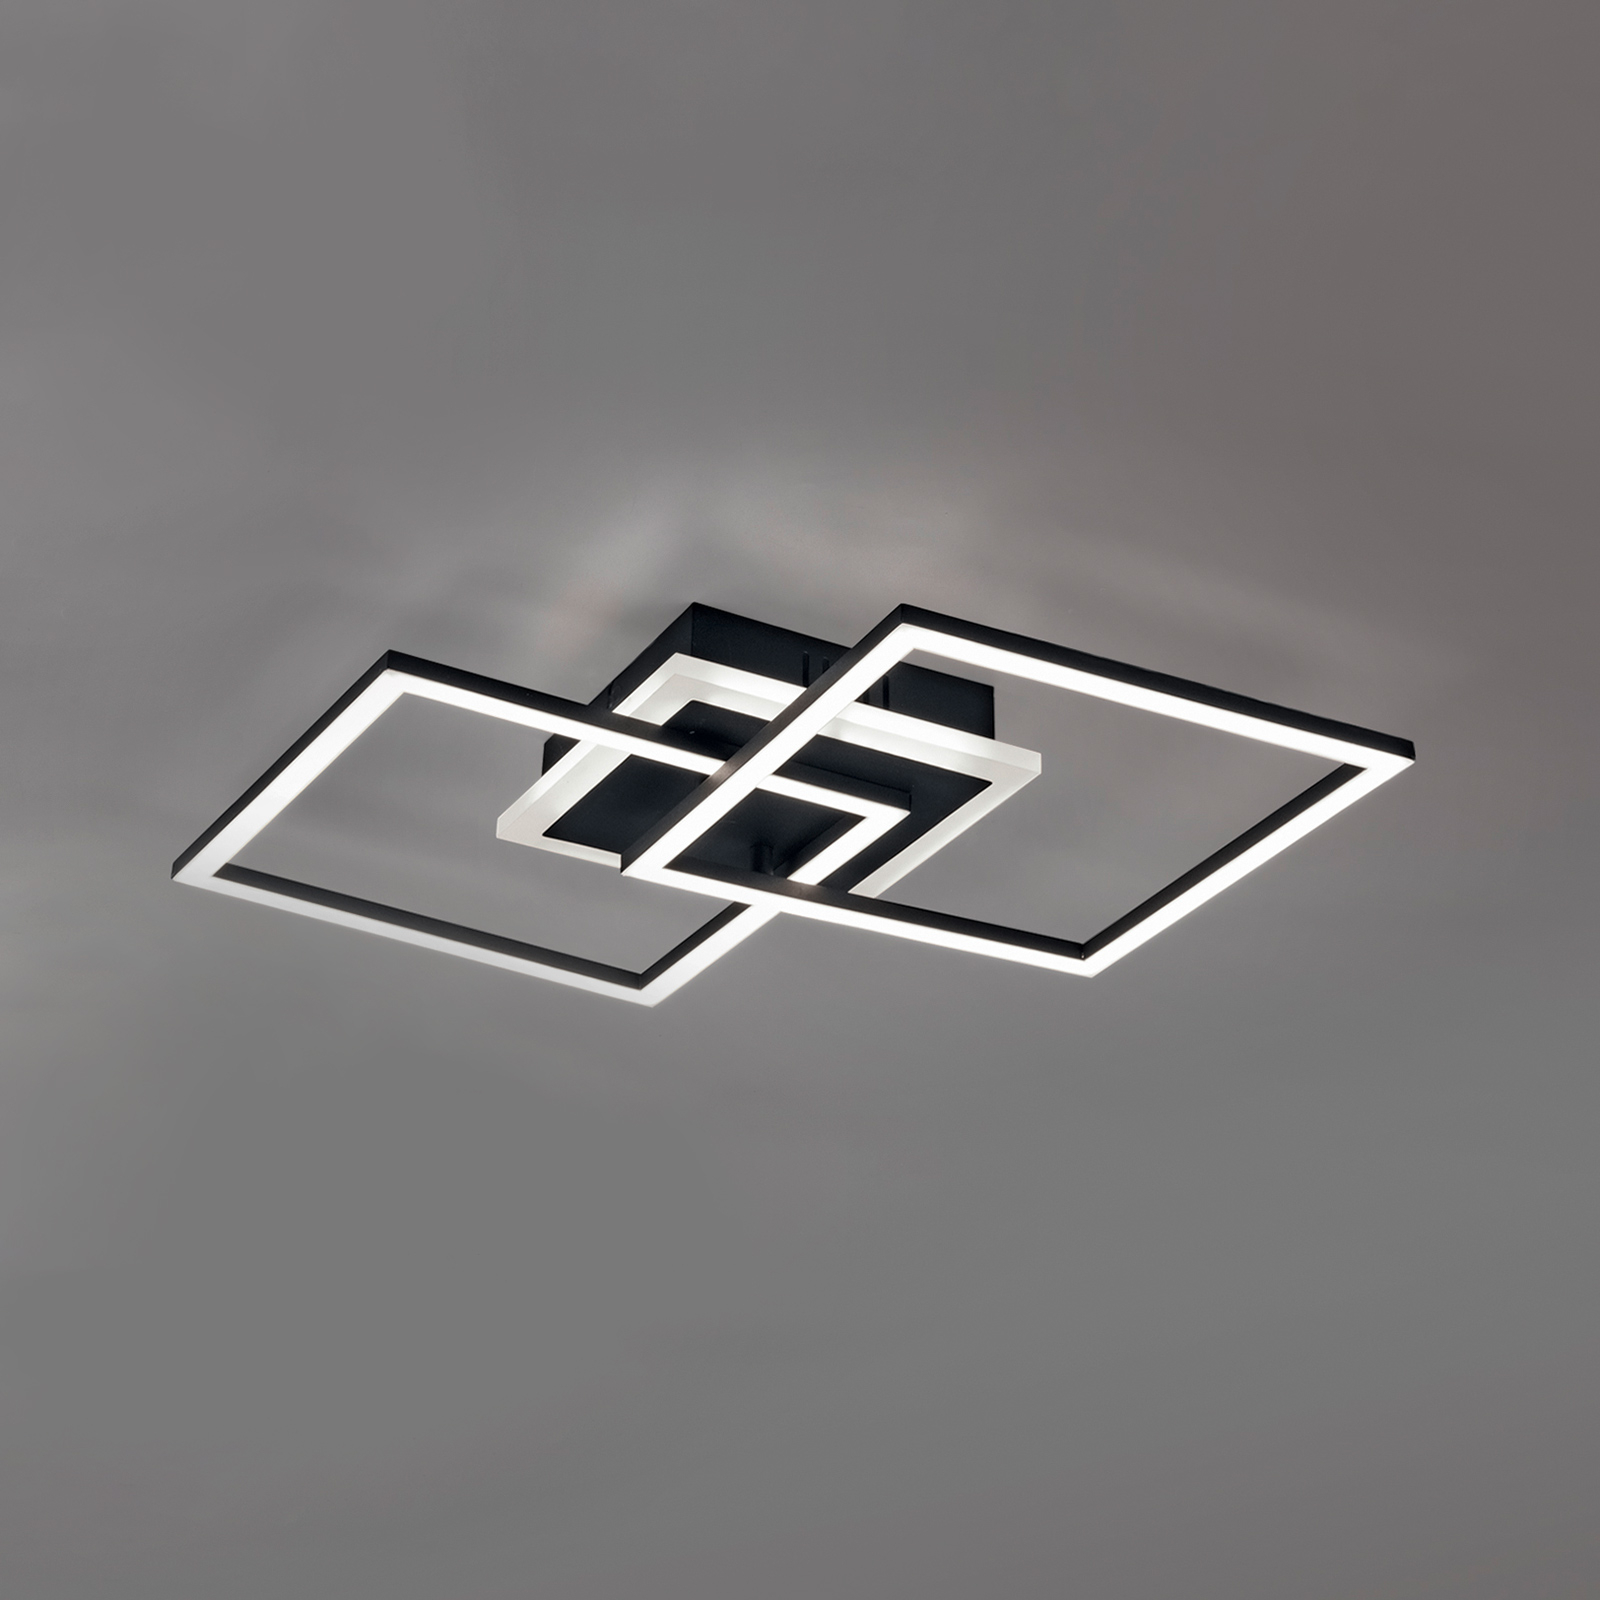 LED plafondlamp Venida, zwart, twee vierkanten